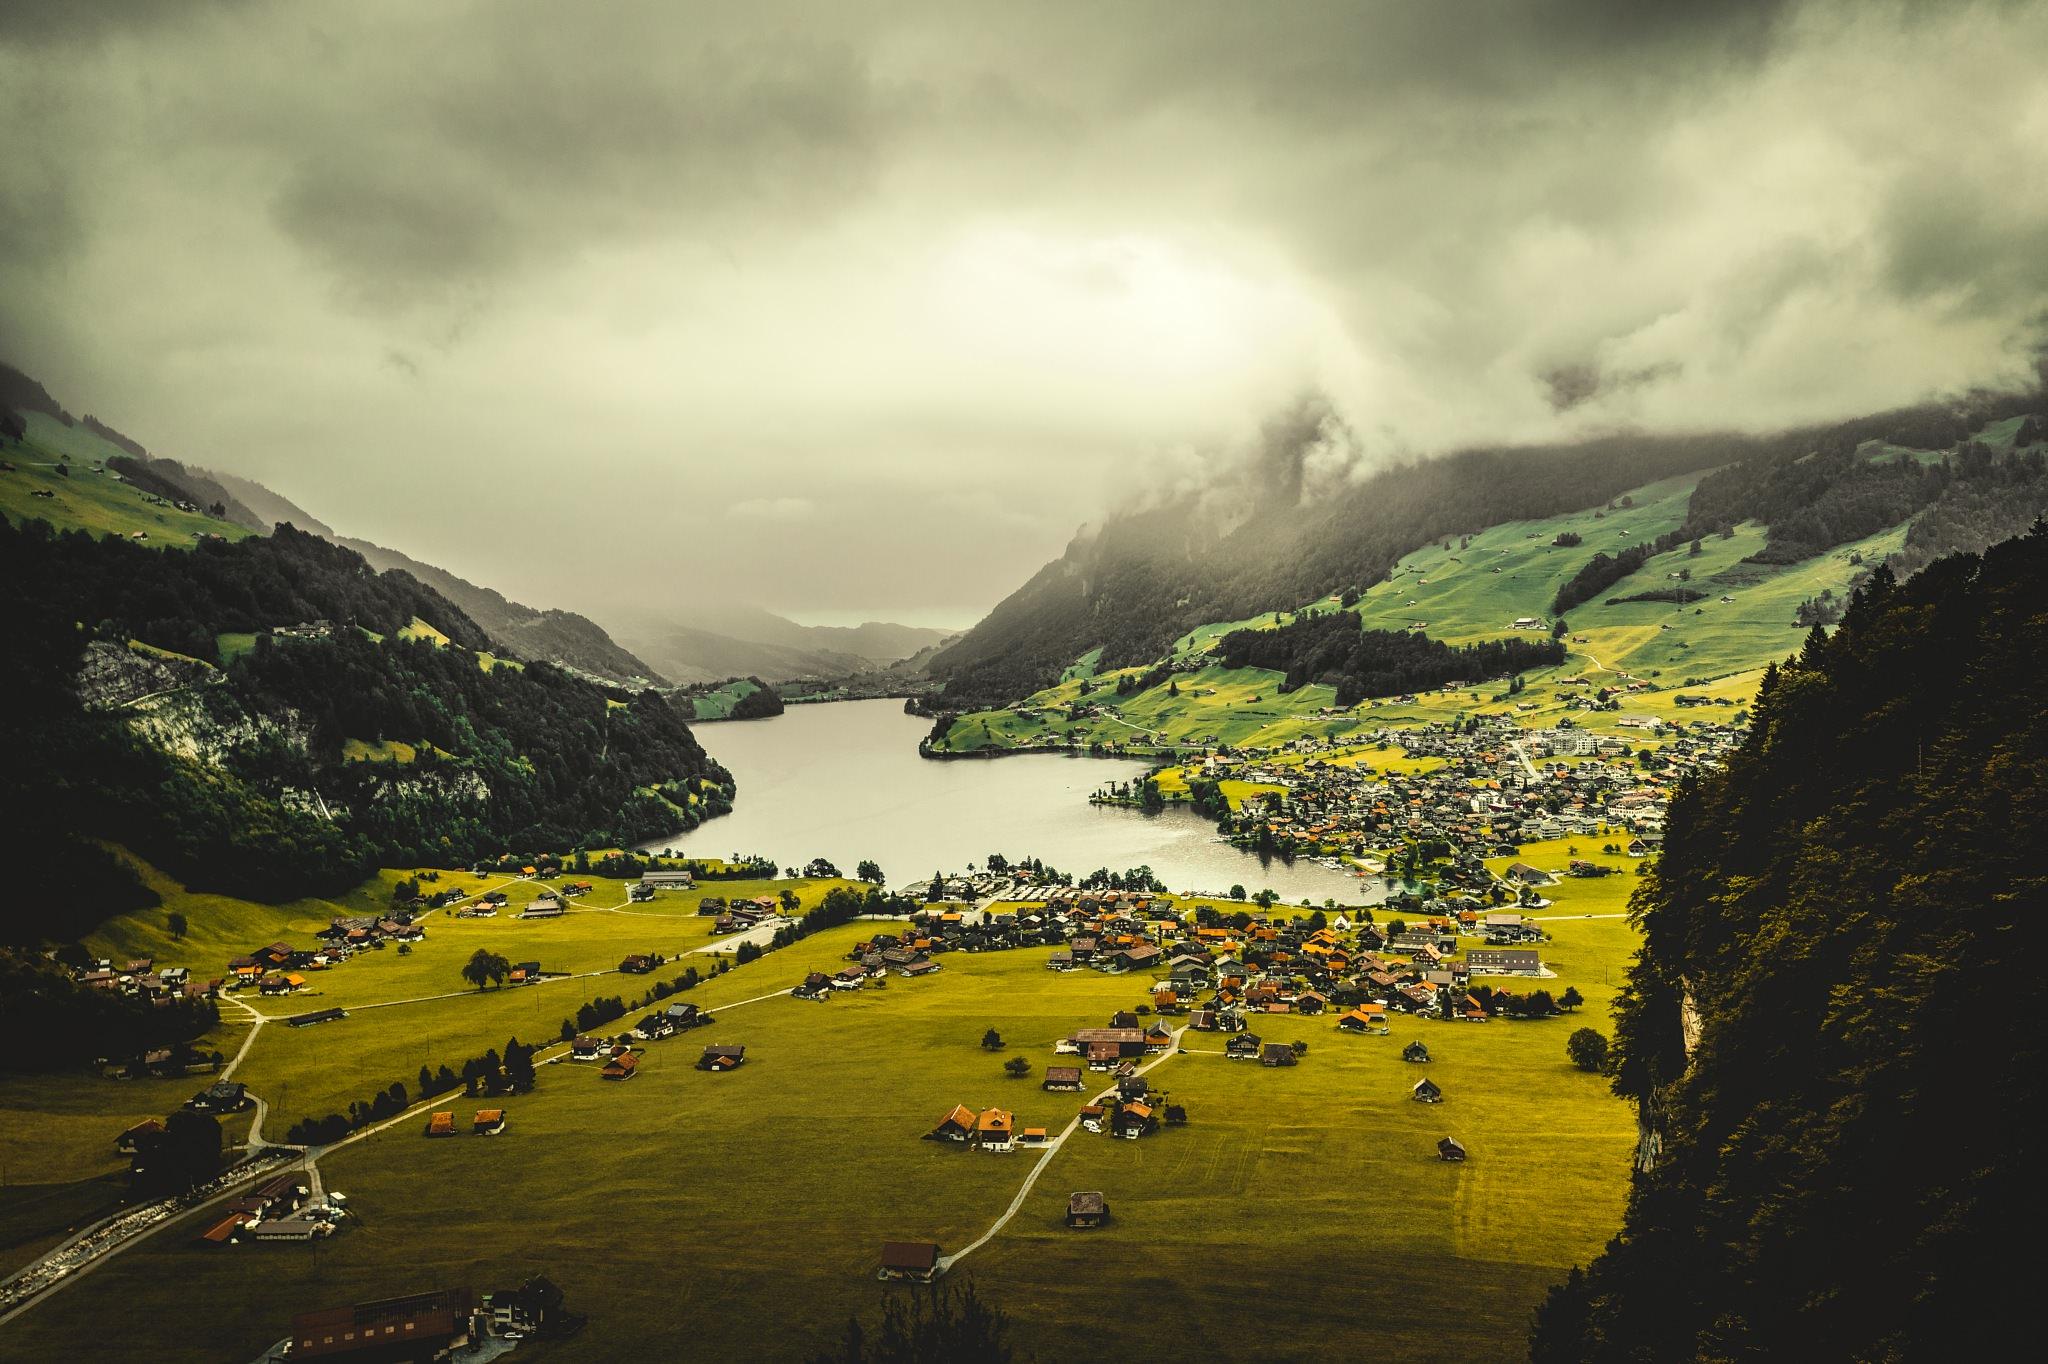 Landscape photography photographer filmmaker frankfurt patrick schmetzer drone landscape nature 37